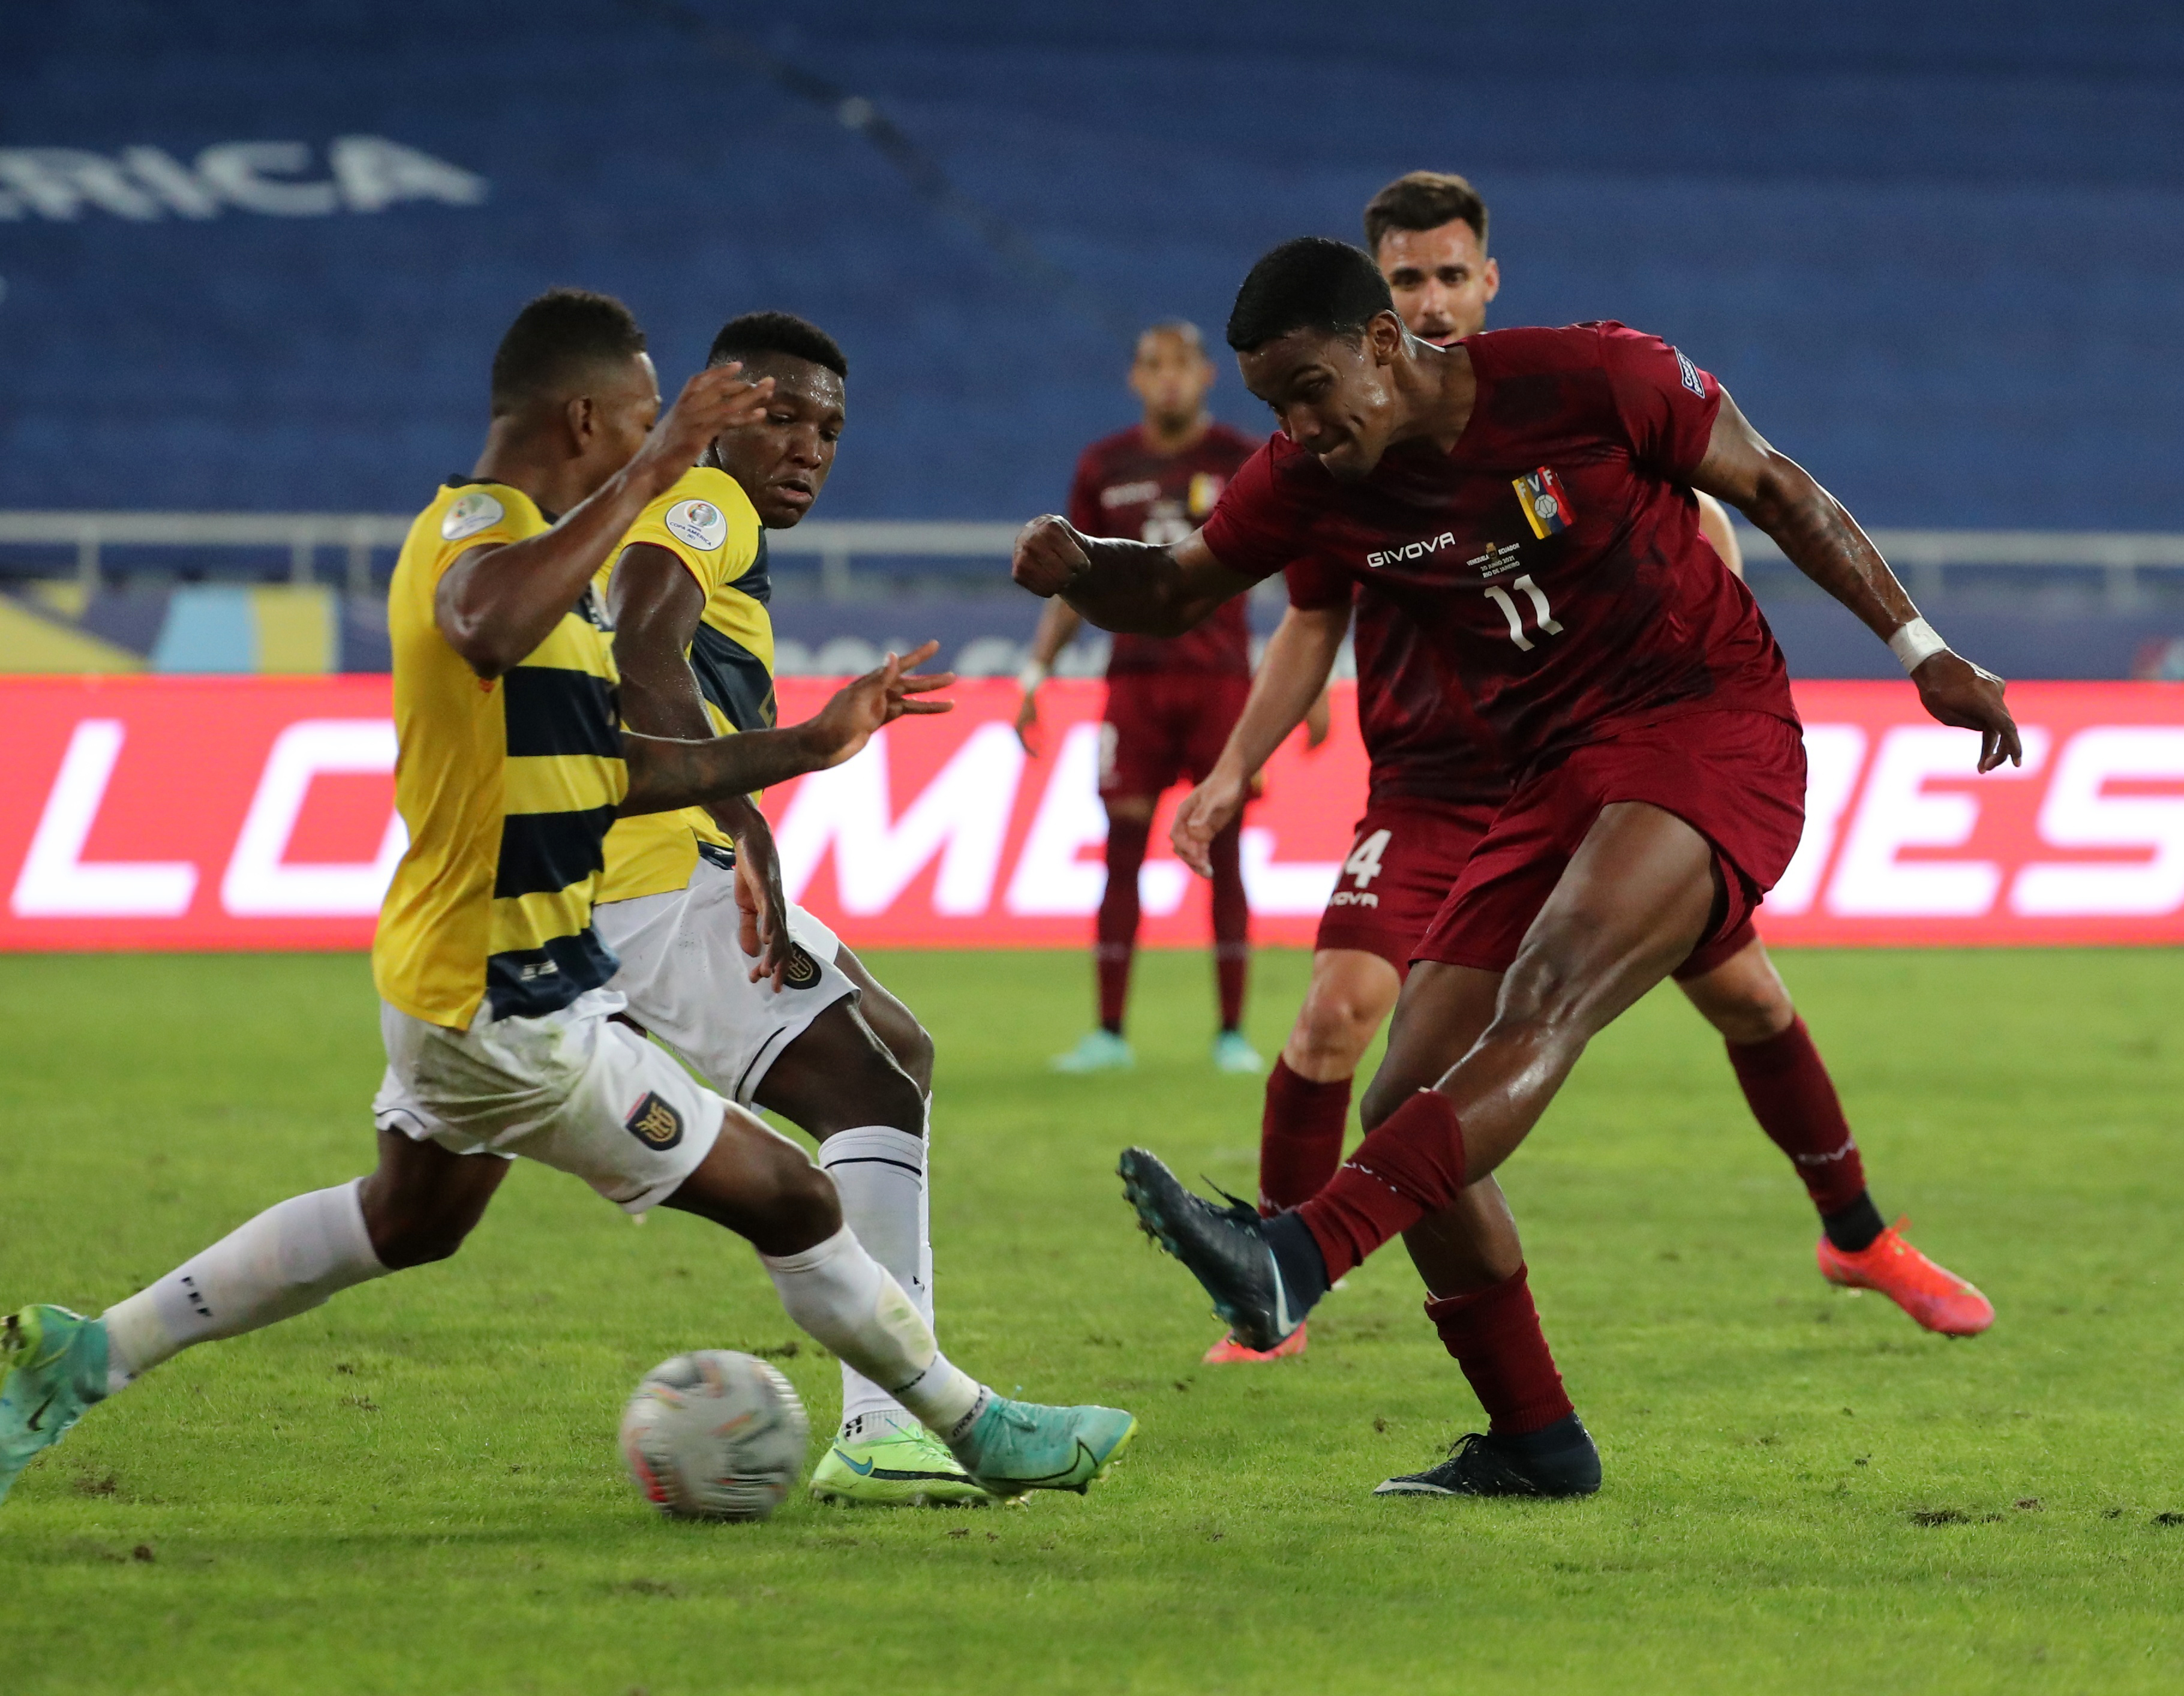 Soccer Football - Copa America 2021 - Group B - Venezuela v Ecuador - Estadio Nilton Santos, Rio de Janeiro, Brazil - June 20, 2021 Venezuela's Sergio Cordova in action REUTERS/Sergio Moraes